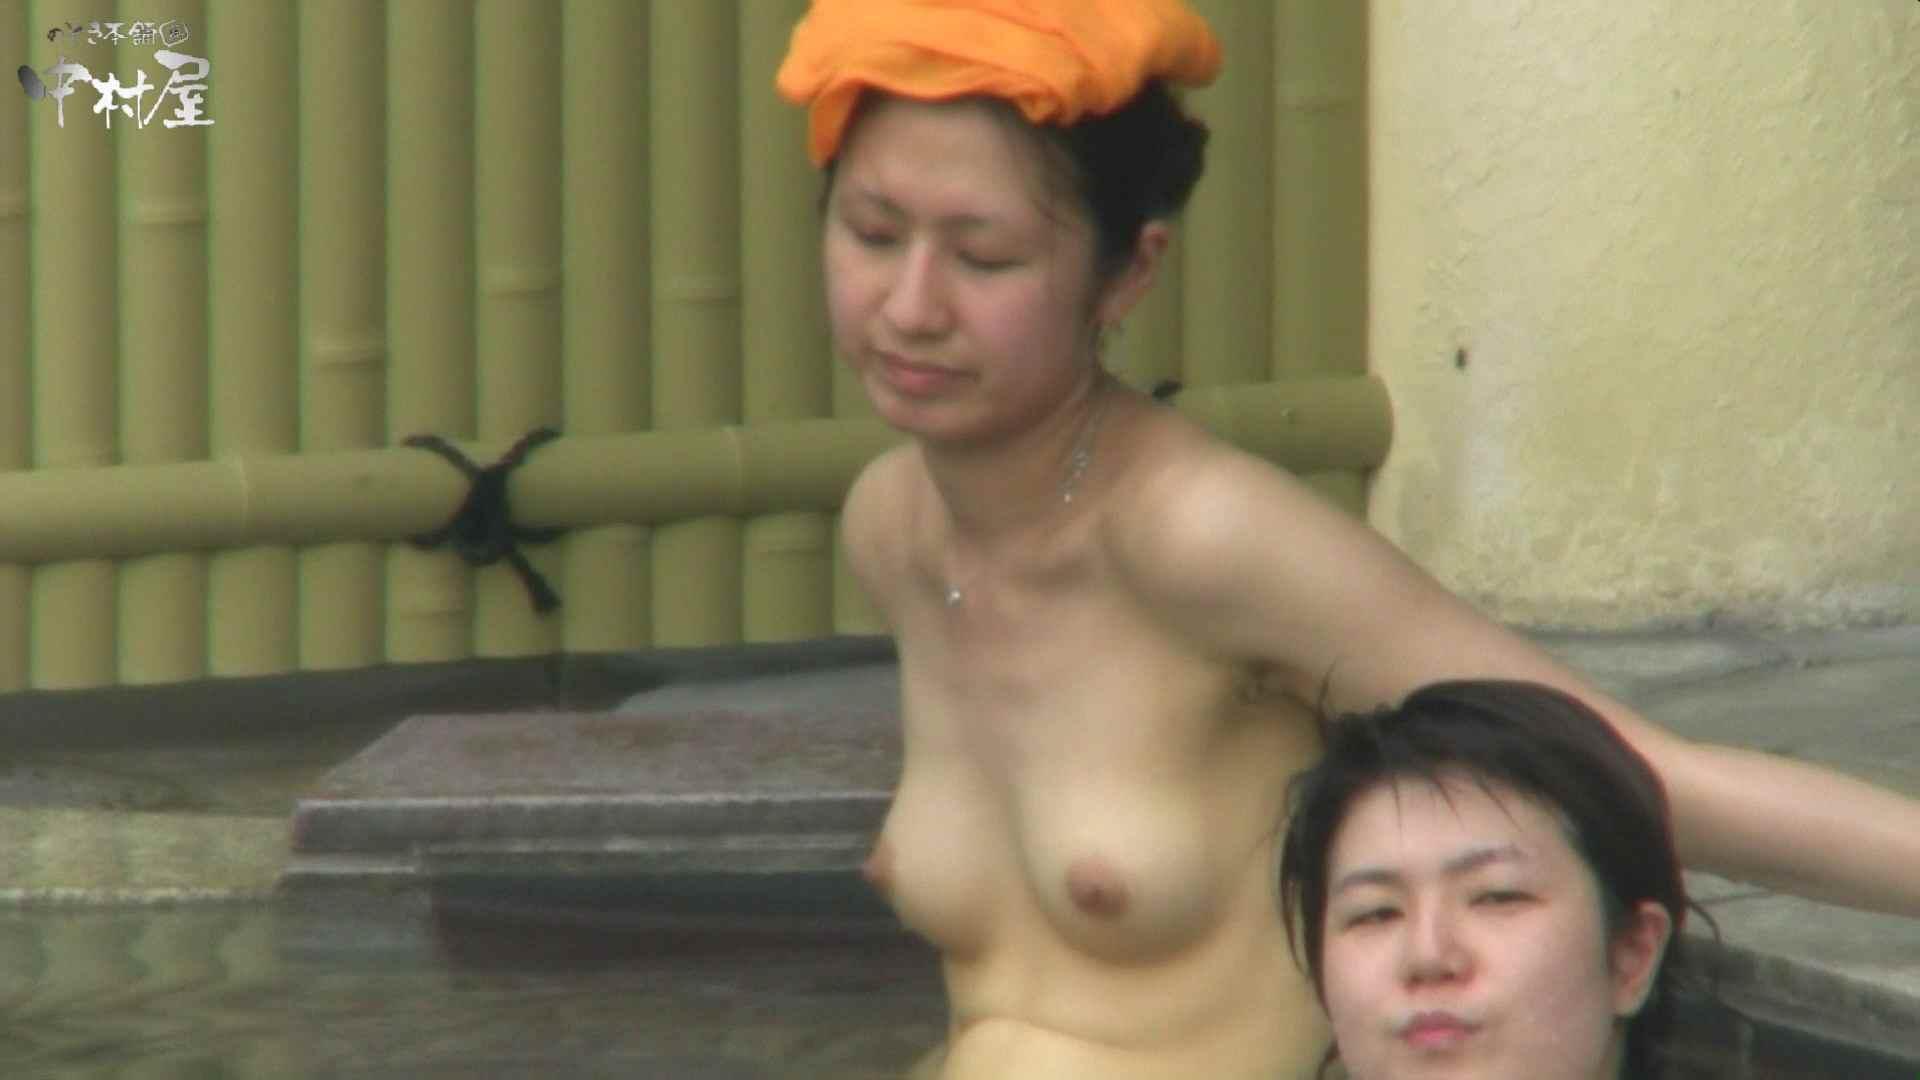 Aquaな露天風呂Vol.945 盗撮 | OLエロ画像  60PICs 37